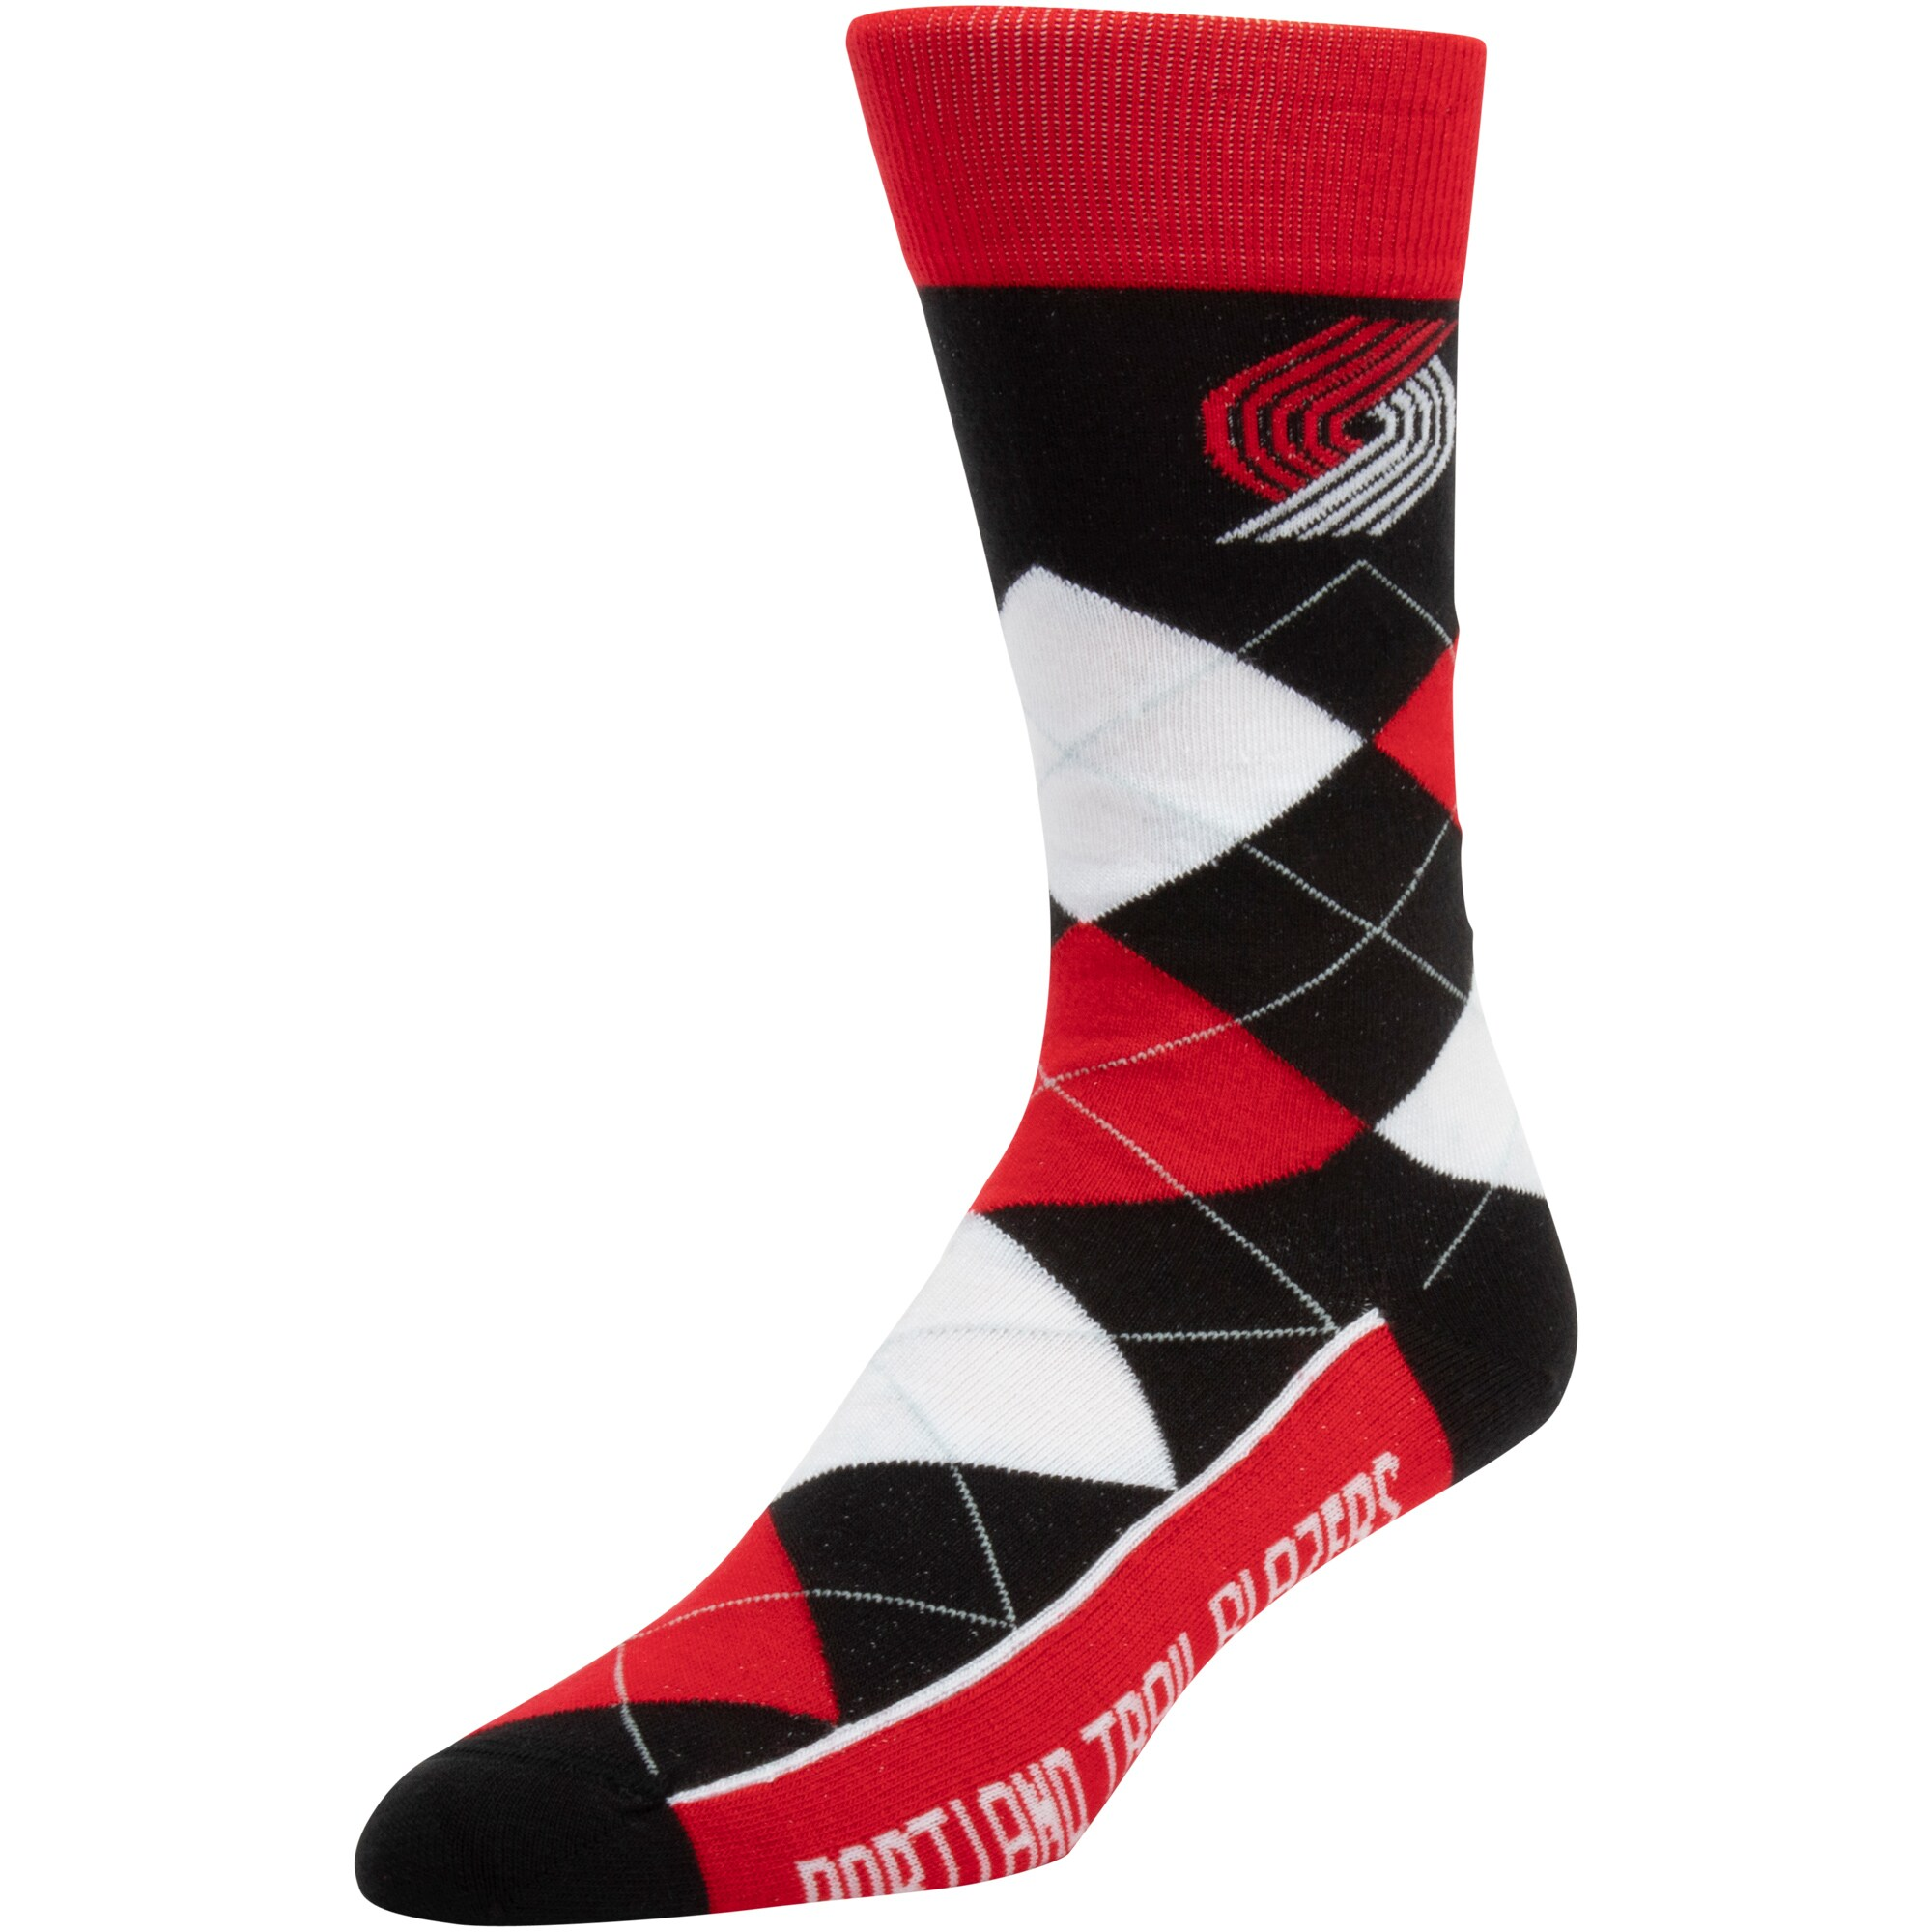 Portland Trail Blazers For Bare Feet New Argyle Socks - Red